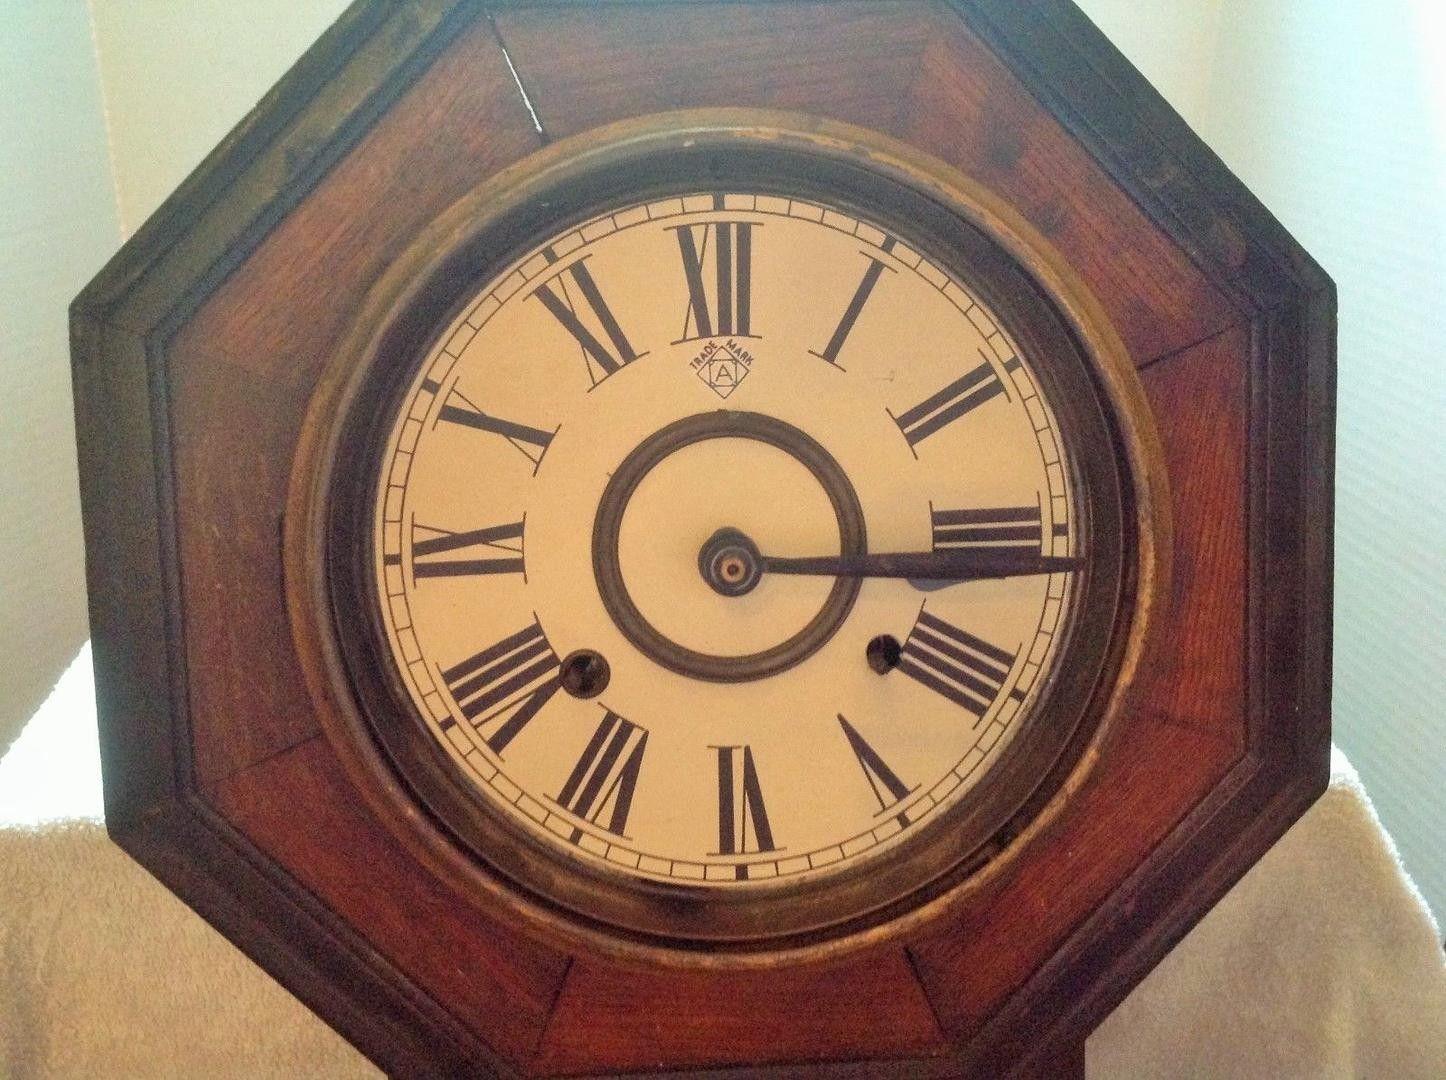 Antique Ansonia Wooden Regulator Schoolhouse Wall Clock